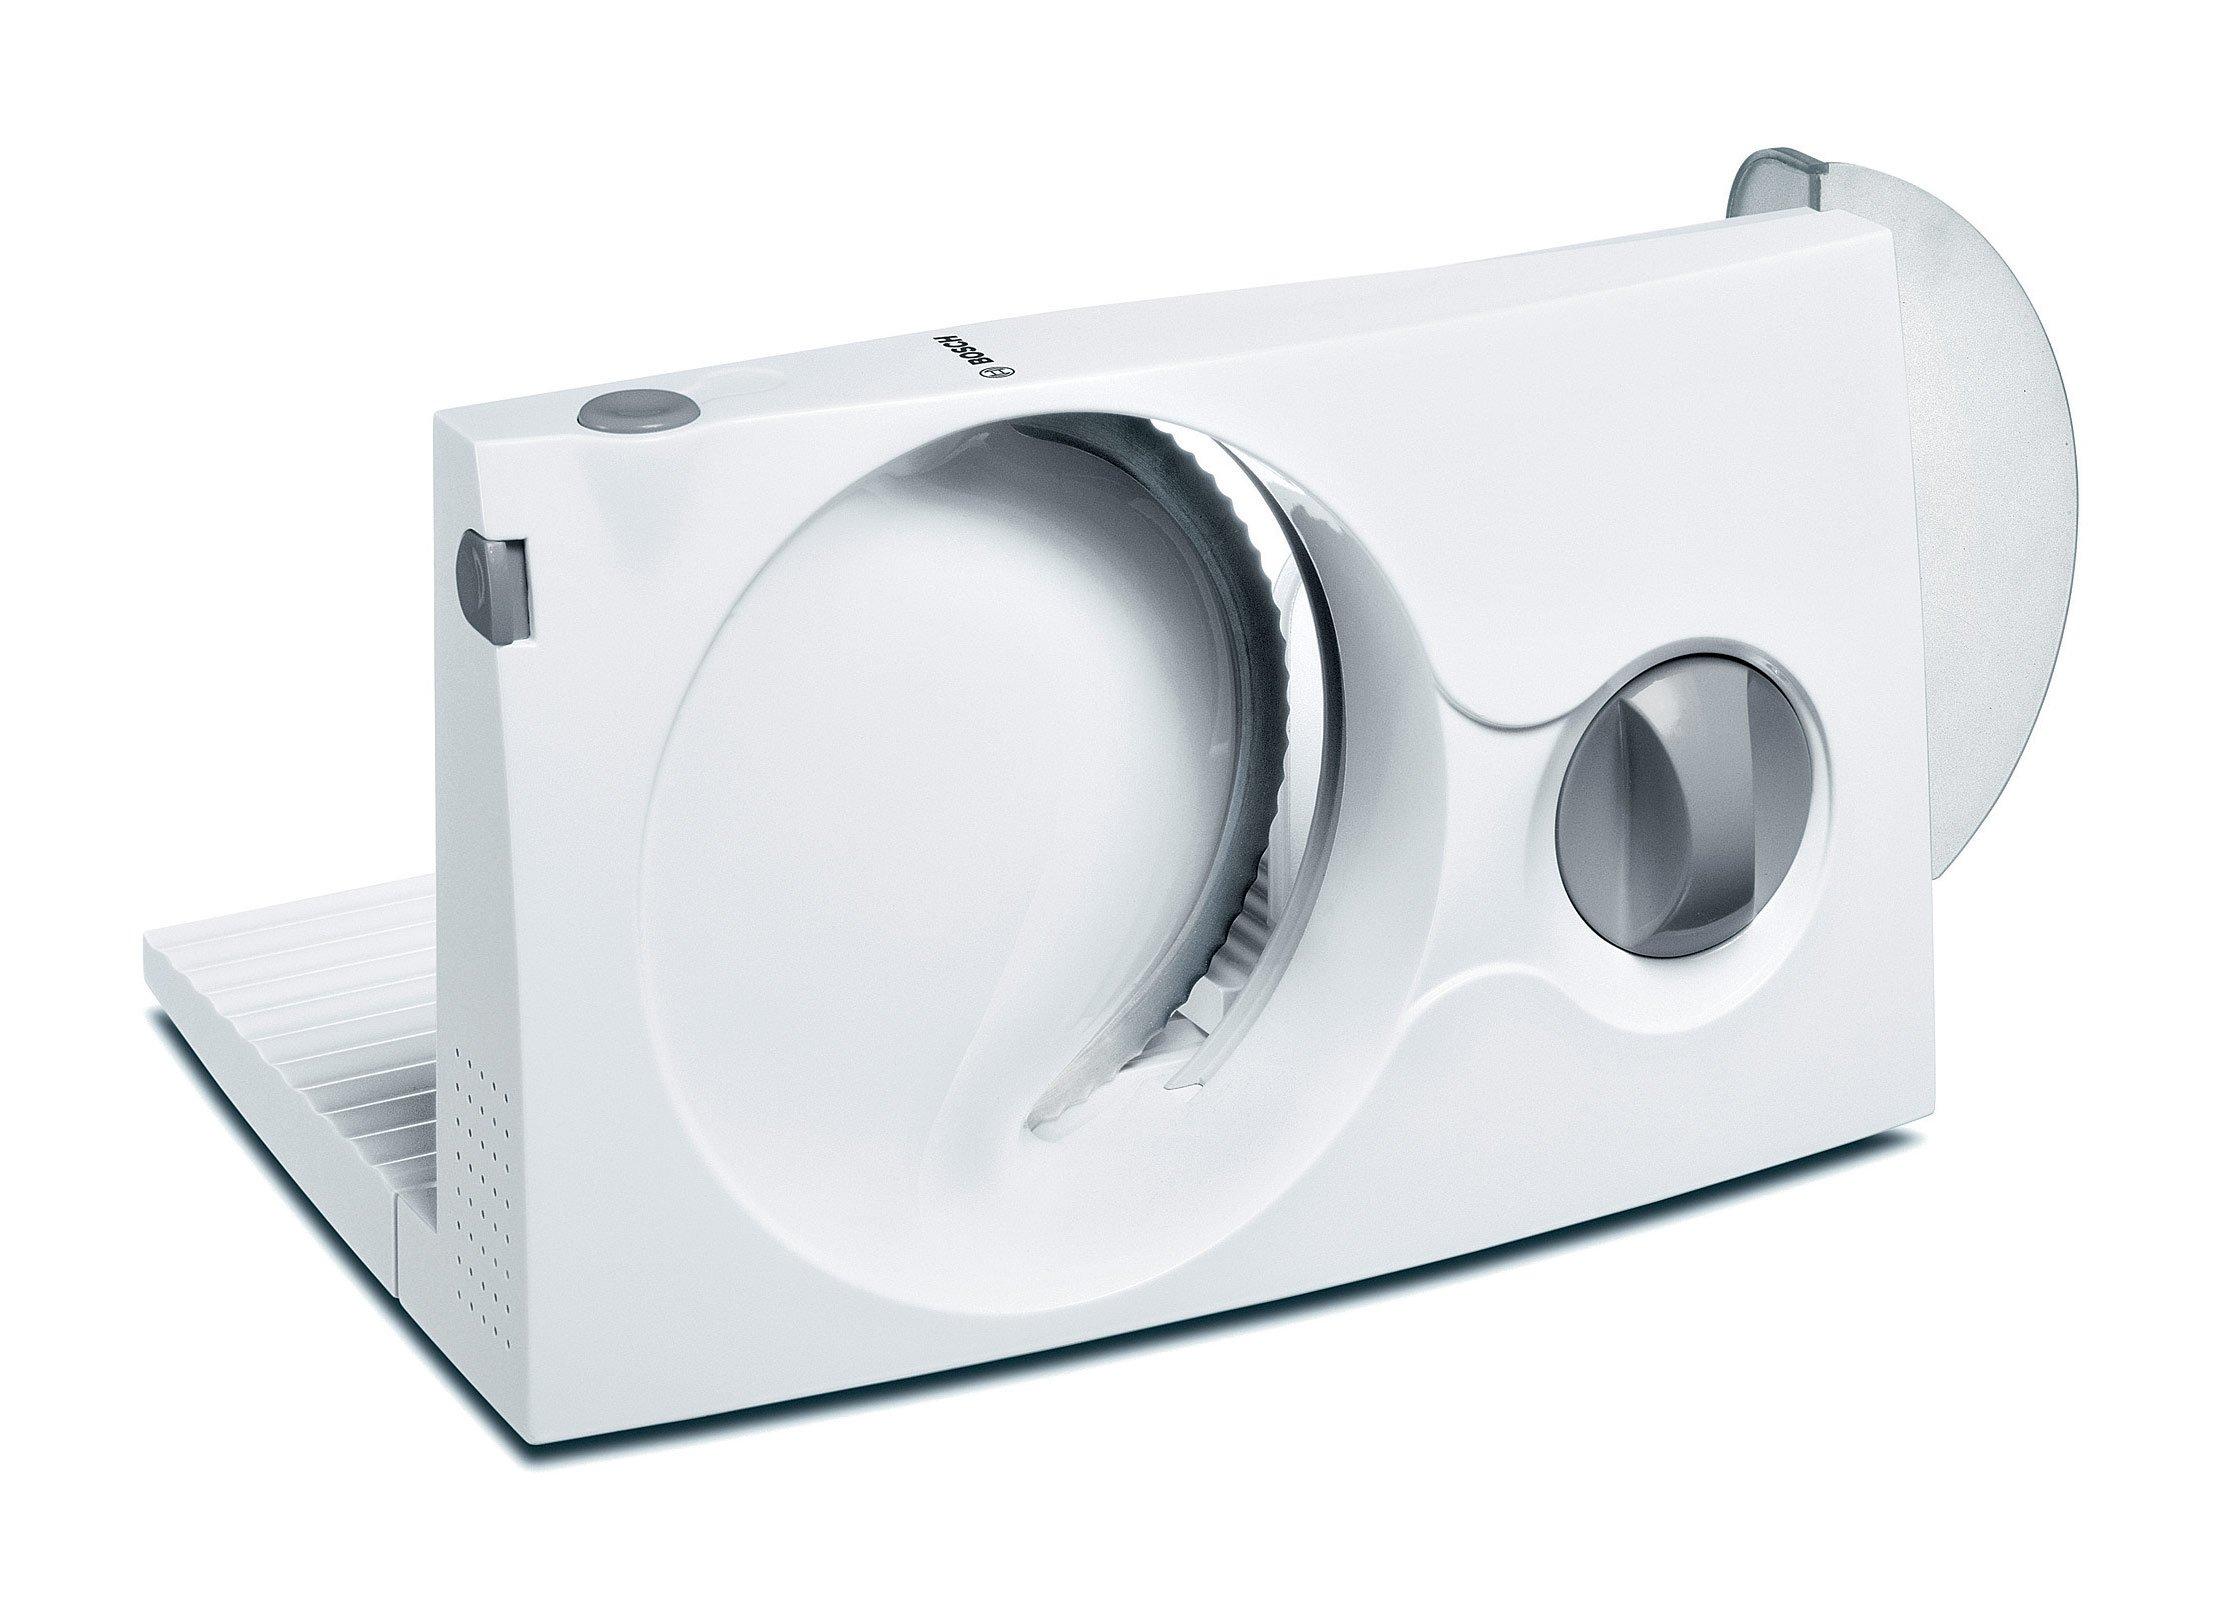 Bosch MAS4201, Blanco, 1570 g, 195 mm, 102 mm, 330 mm, 100 W ...